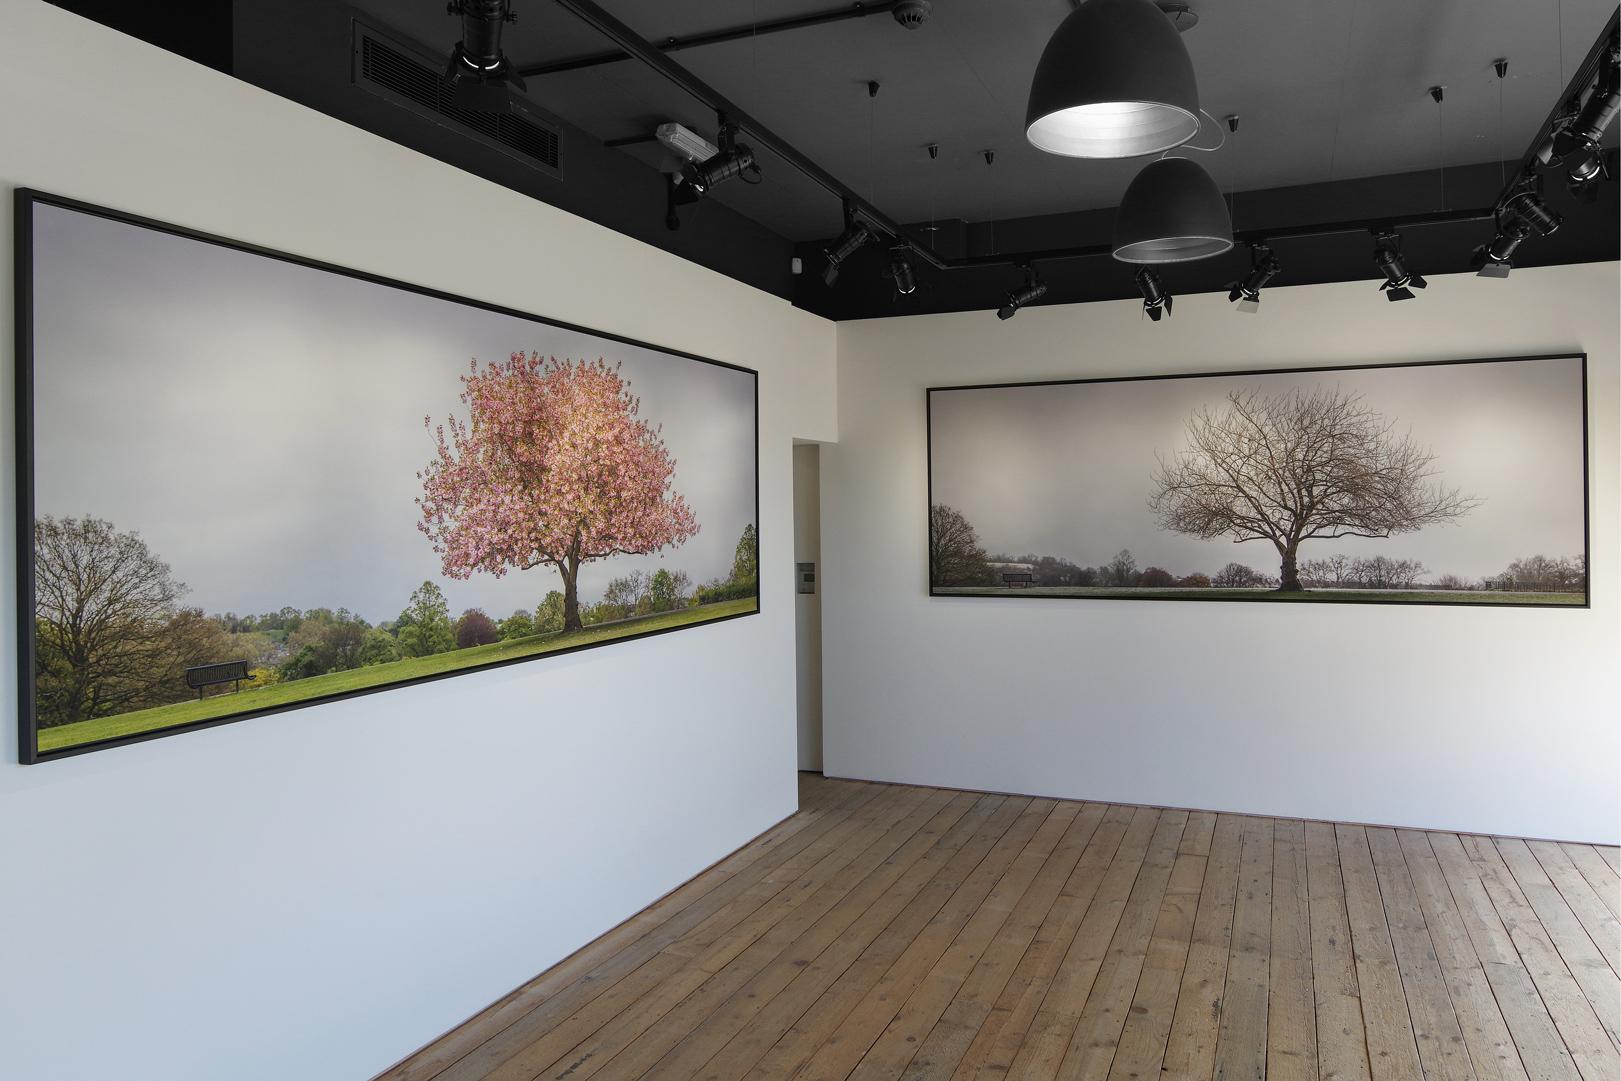 Wild-Cherry-03-Main-Gallery-Revised-Web.jpg